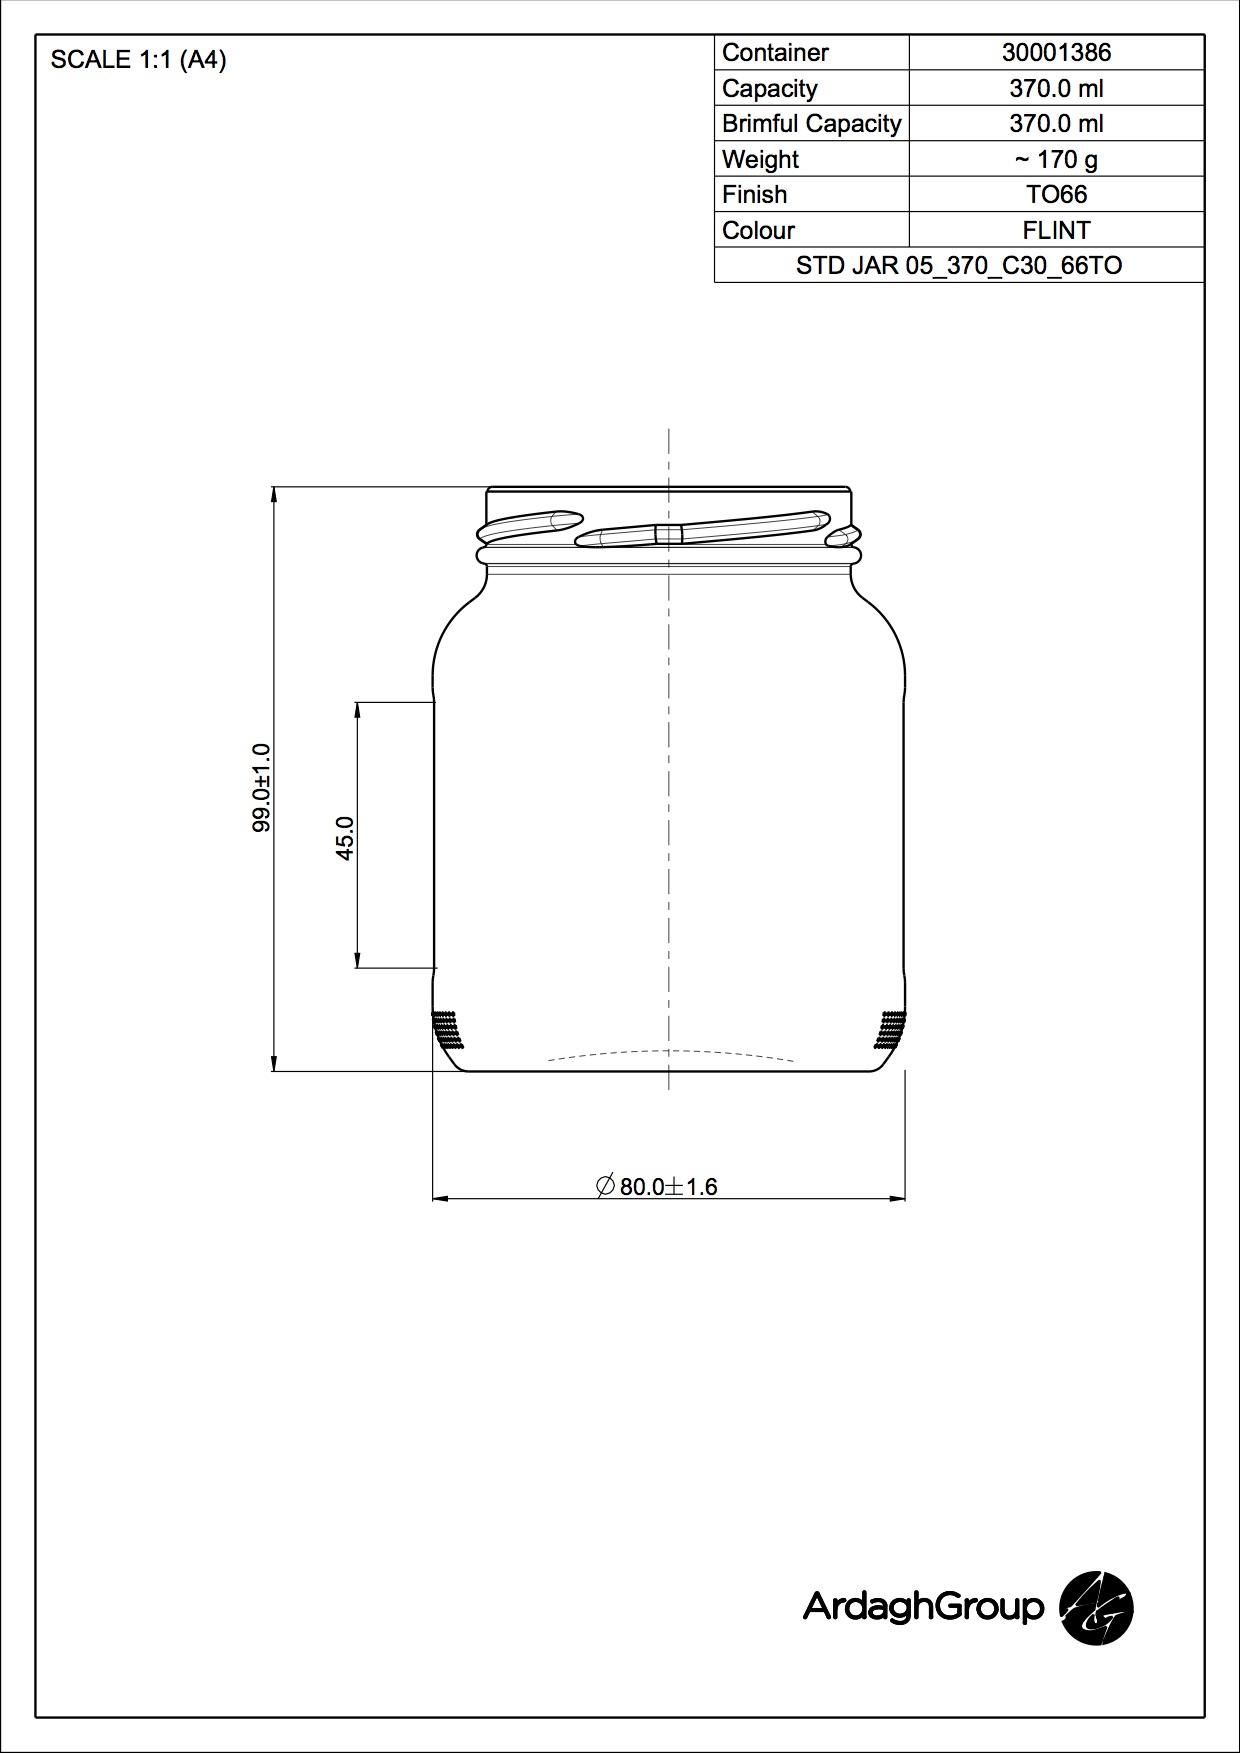 STD JAR 05 370 C30 66TO